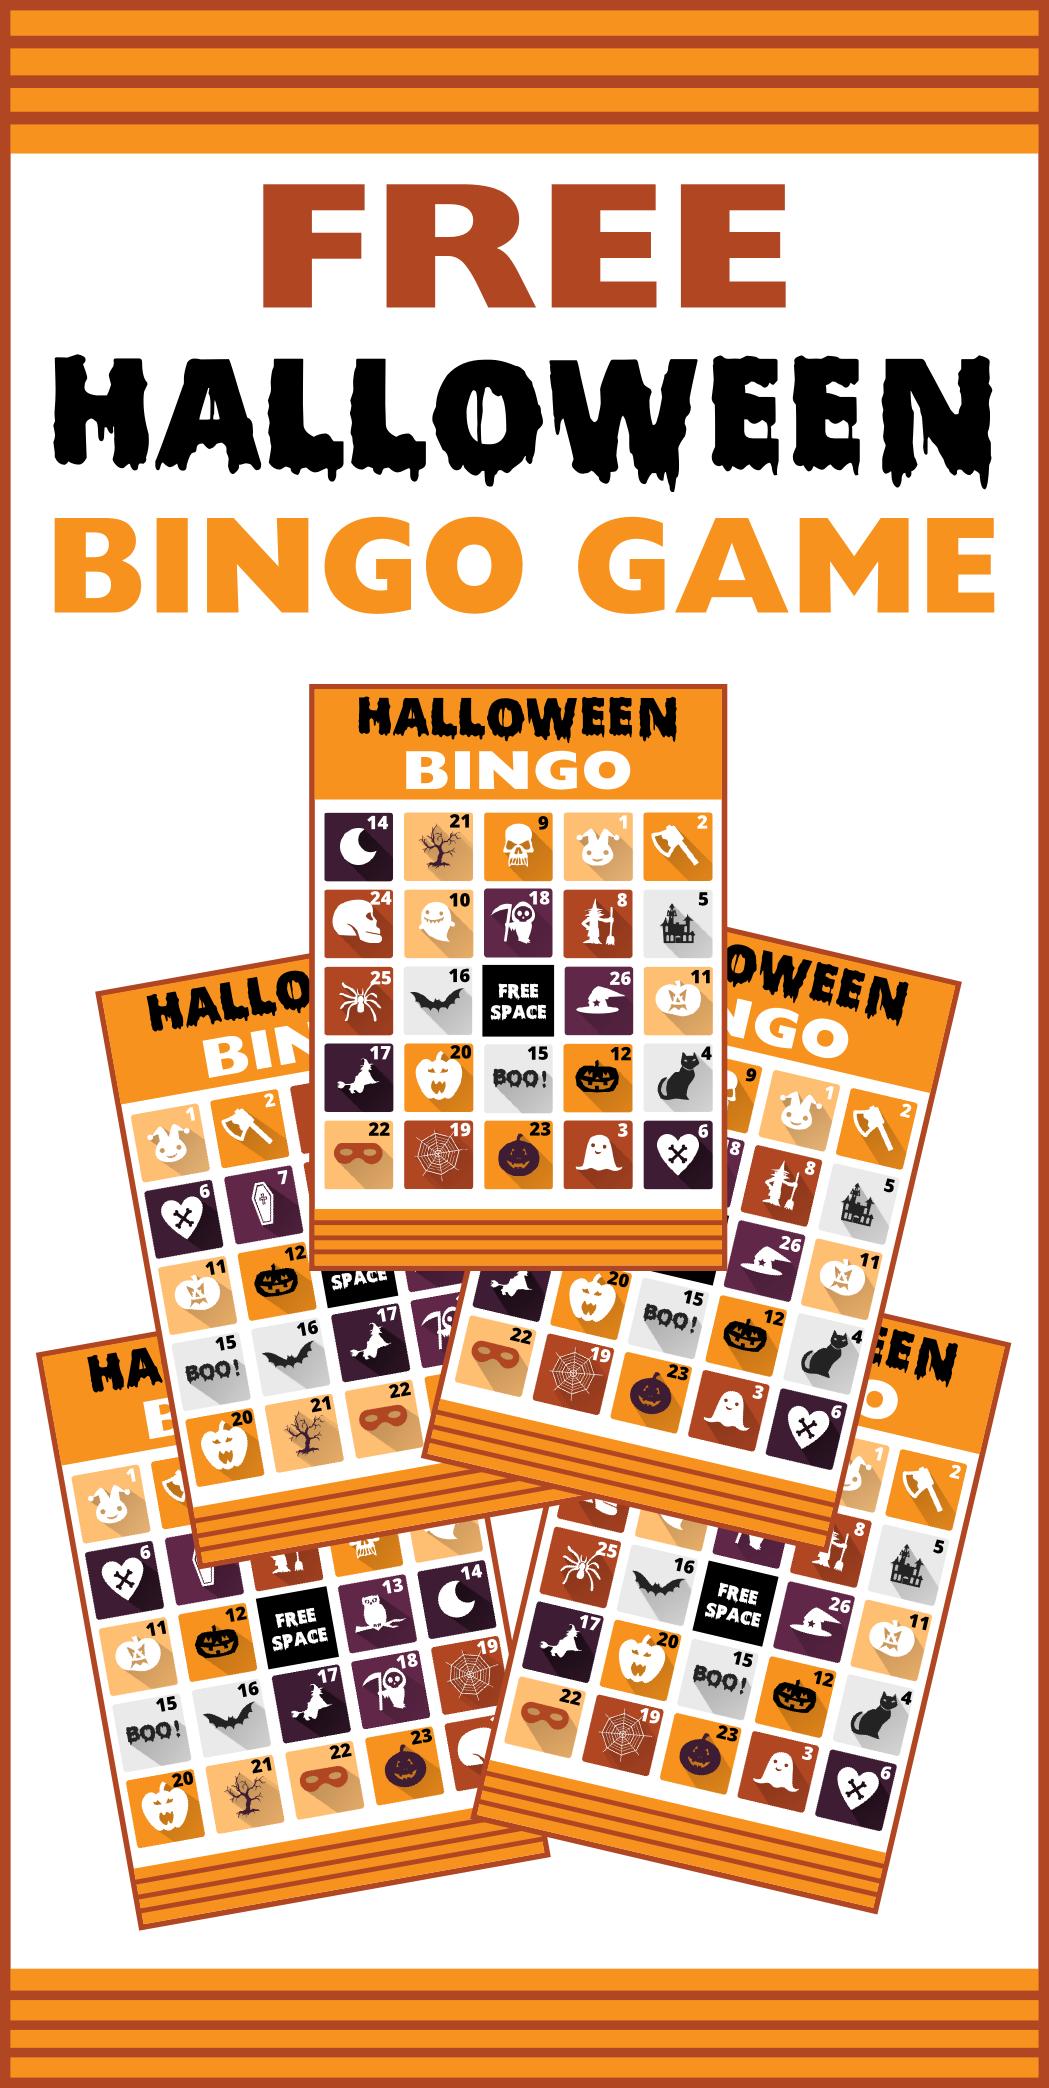 Free Printable Halloween Bingo Cards | Catch My Party - Free Printable Halloween Bingo